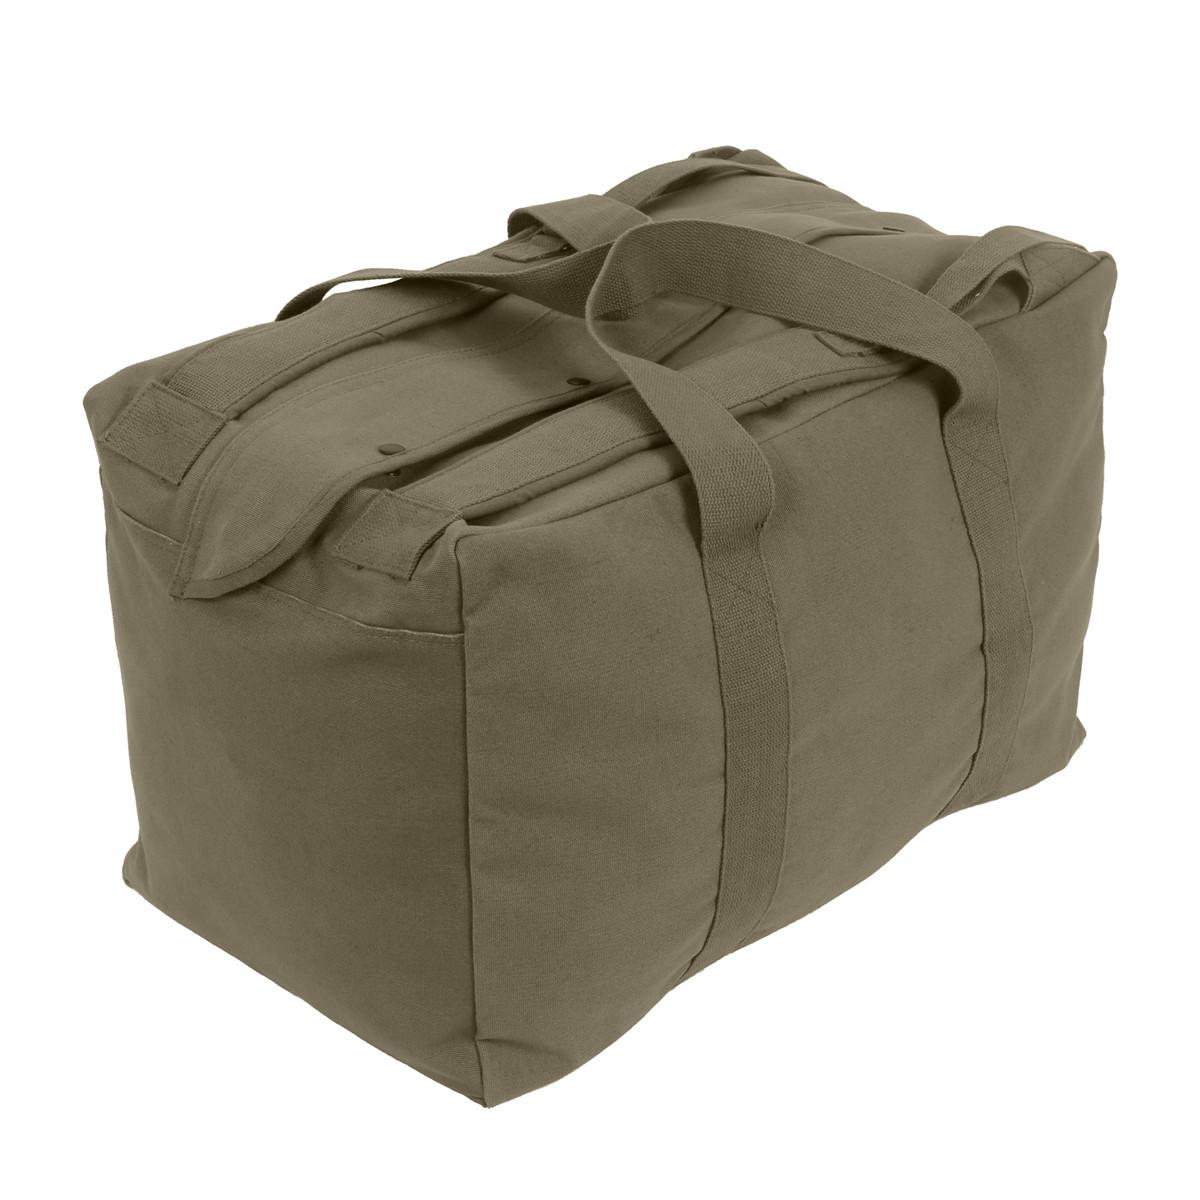 54bacf2c81 Shop Tactical Mossad Backpack Cargo Bag - Fatigues Army Navy Gear